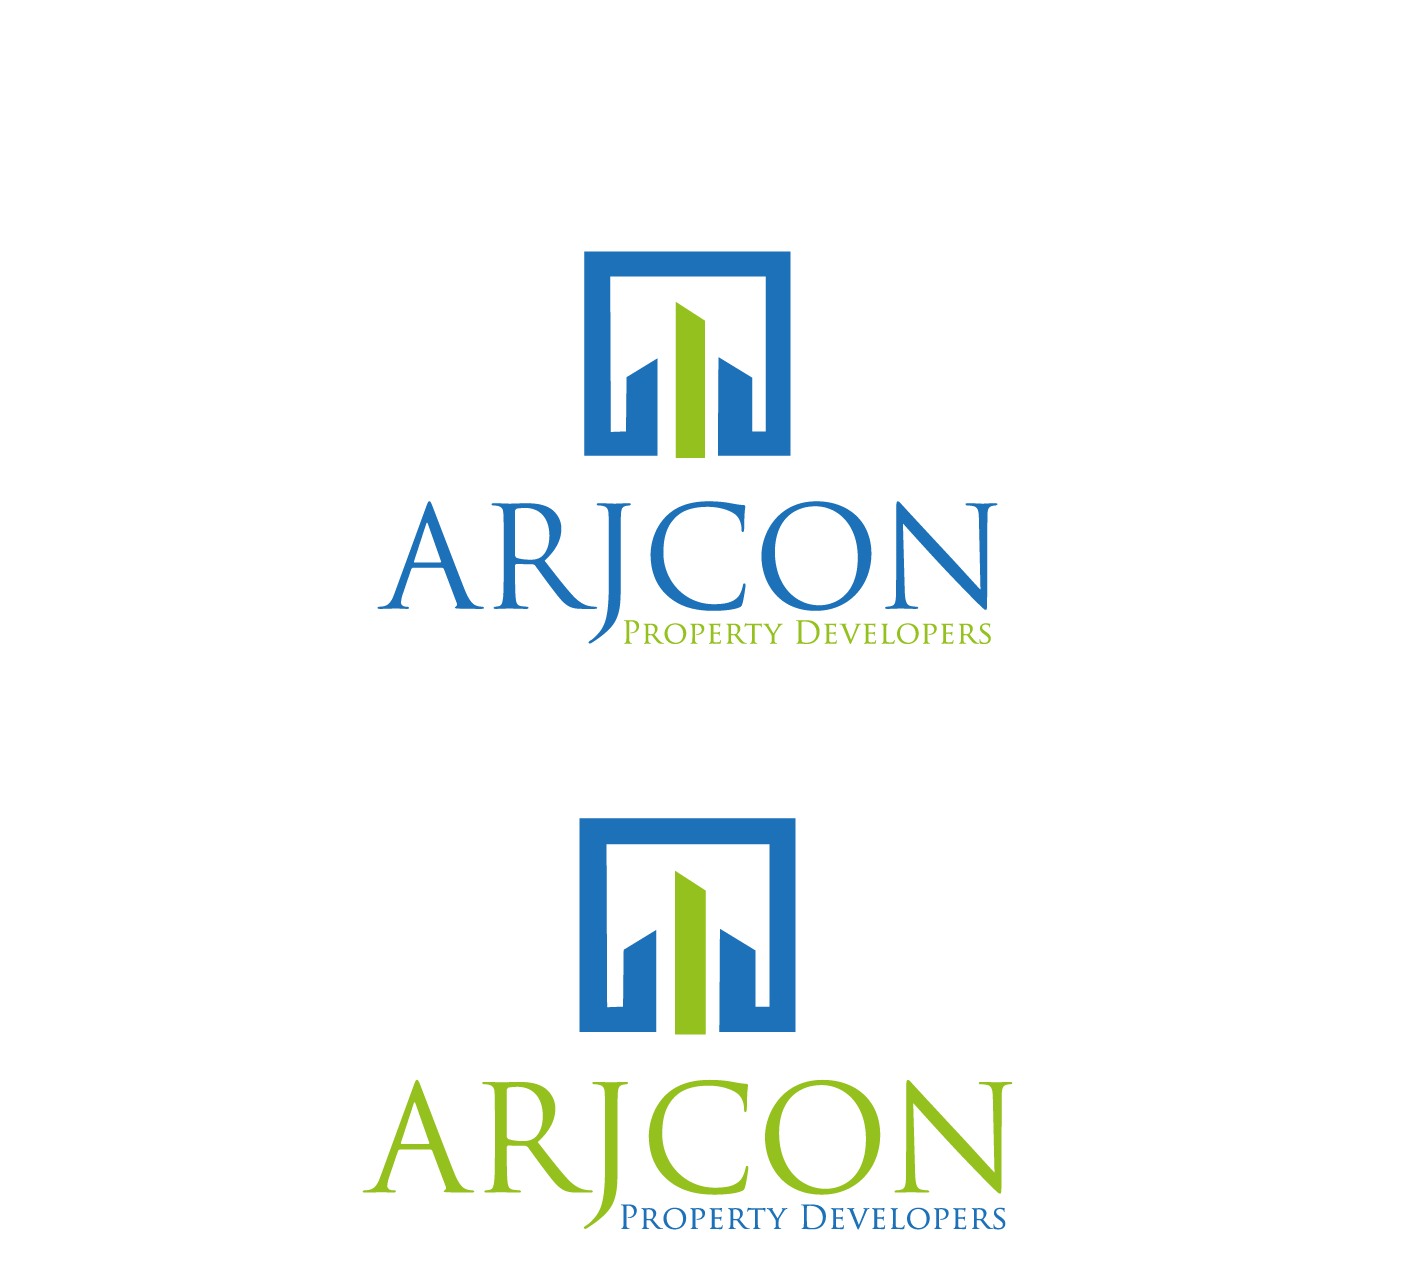 Logo Design by Apurba kumar Biswas - Entry No. 11 in the Logo Design Contest Inspiring Logo Design for ARJCON.